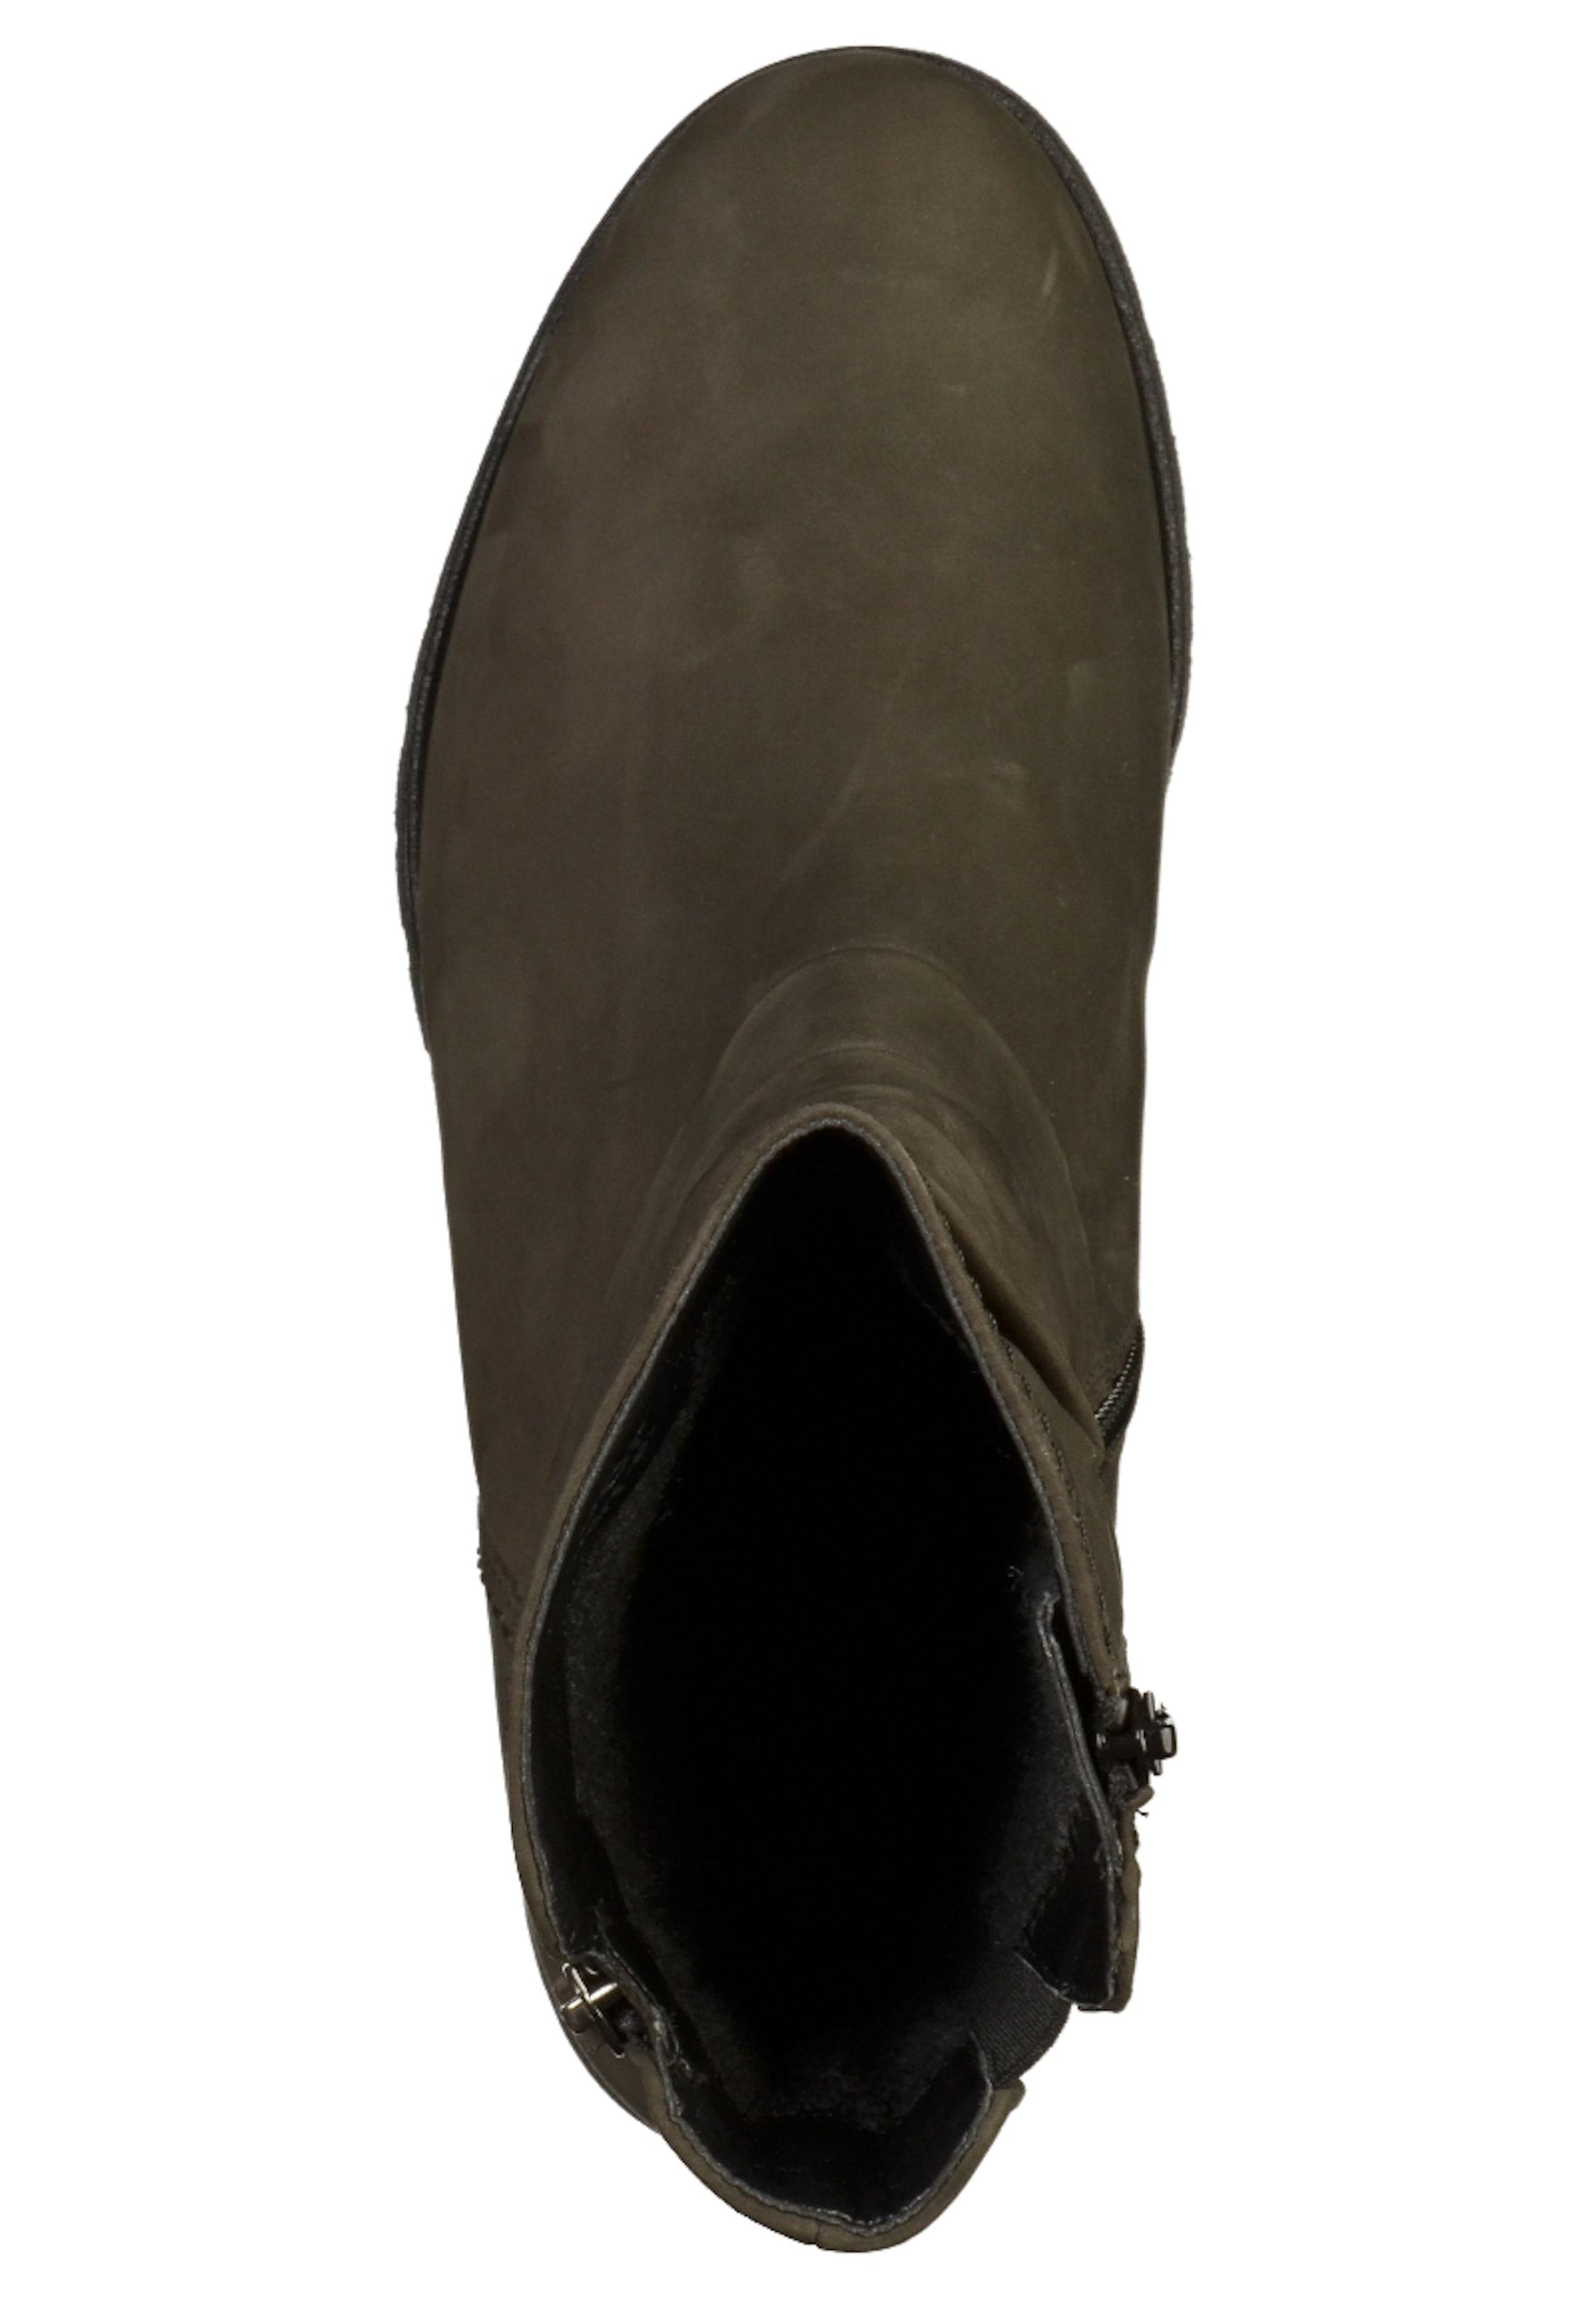 Stiefel In Stiefel Stiefel Stone Gabor In In Gabor Stone Gabor qUVpGzMLSj